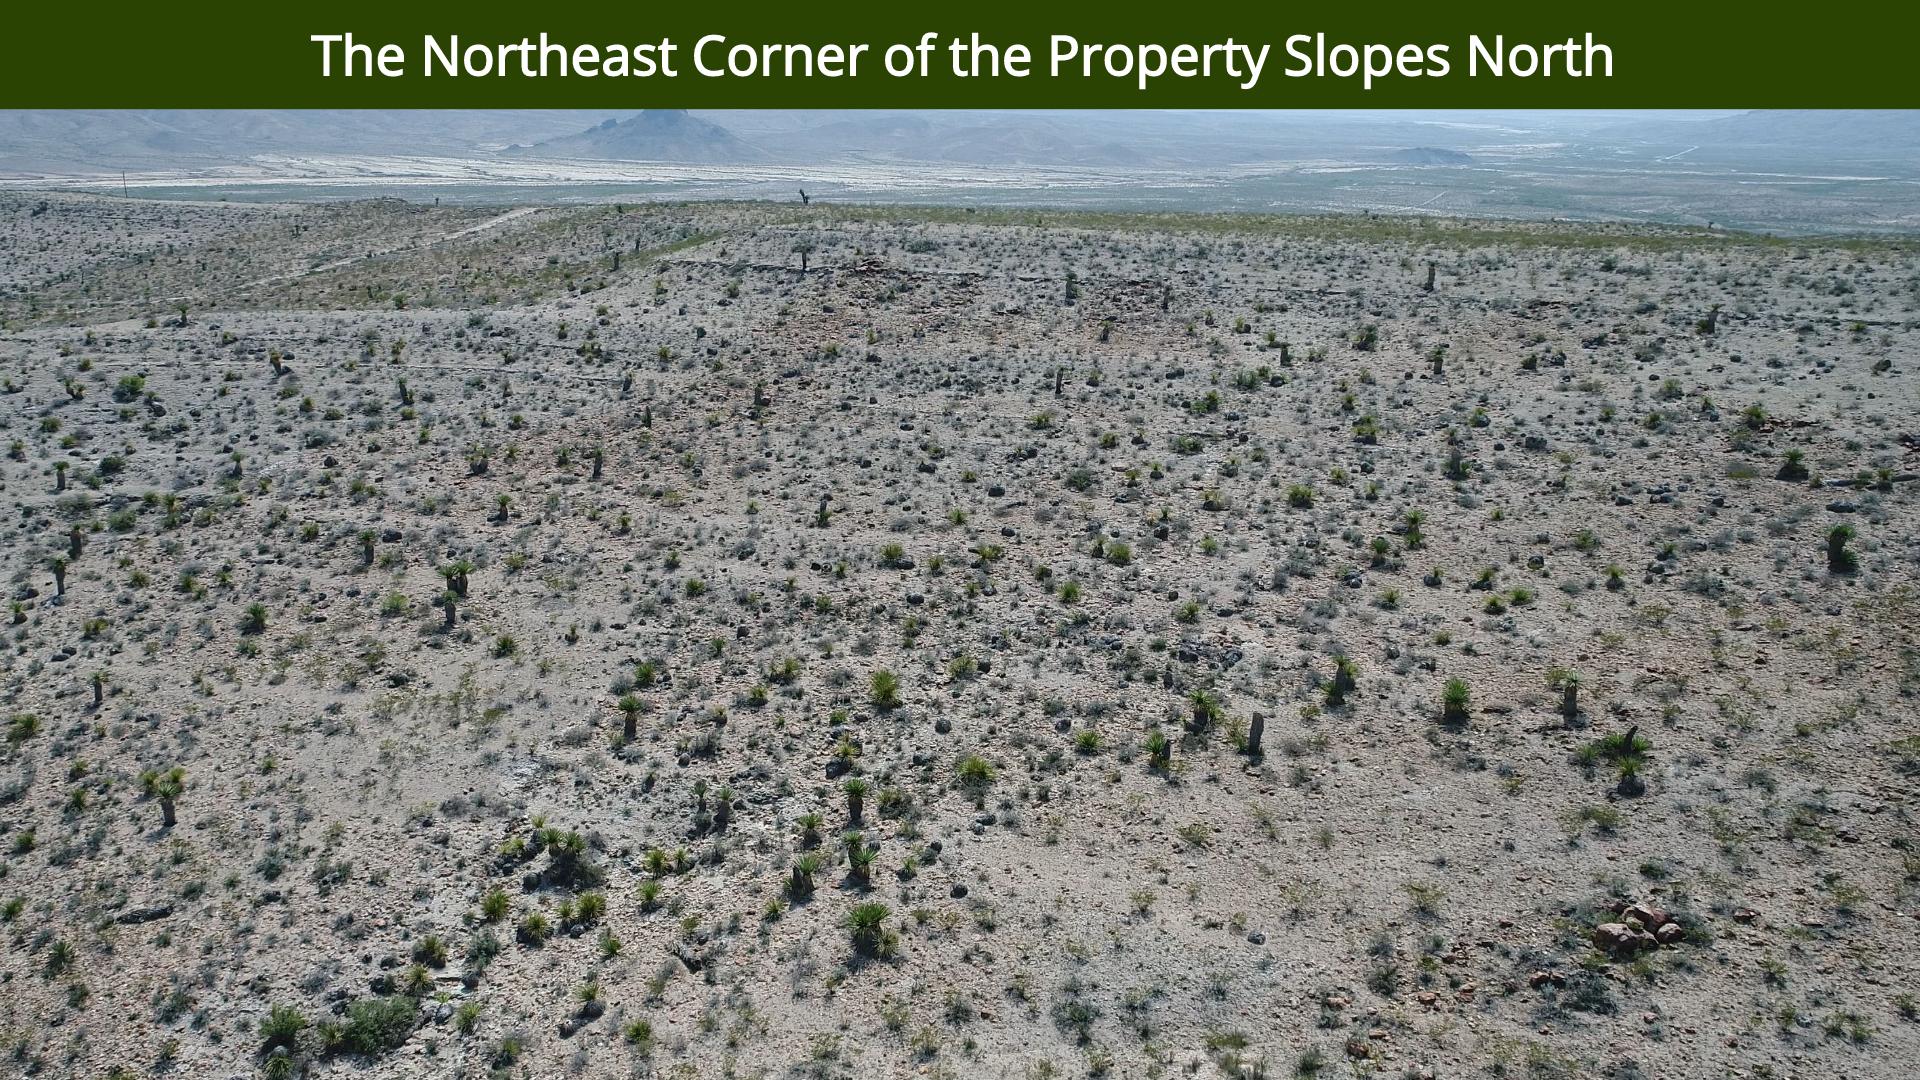 The Northeast Corner of the Property Slo